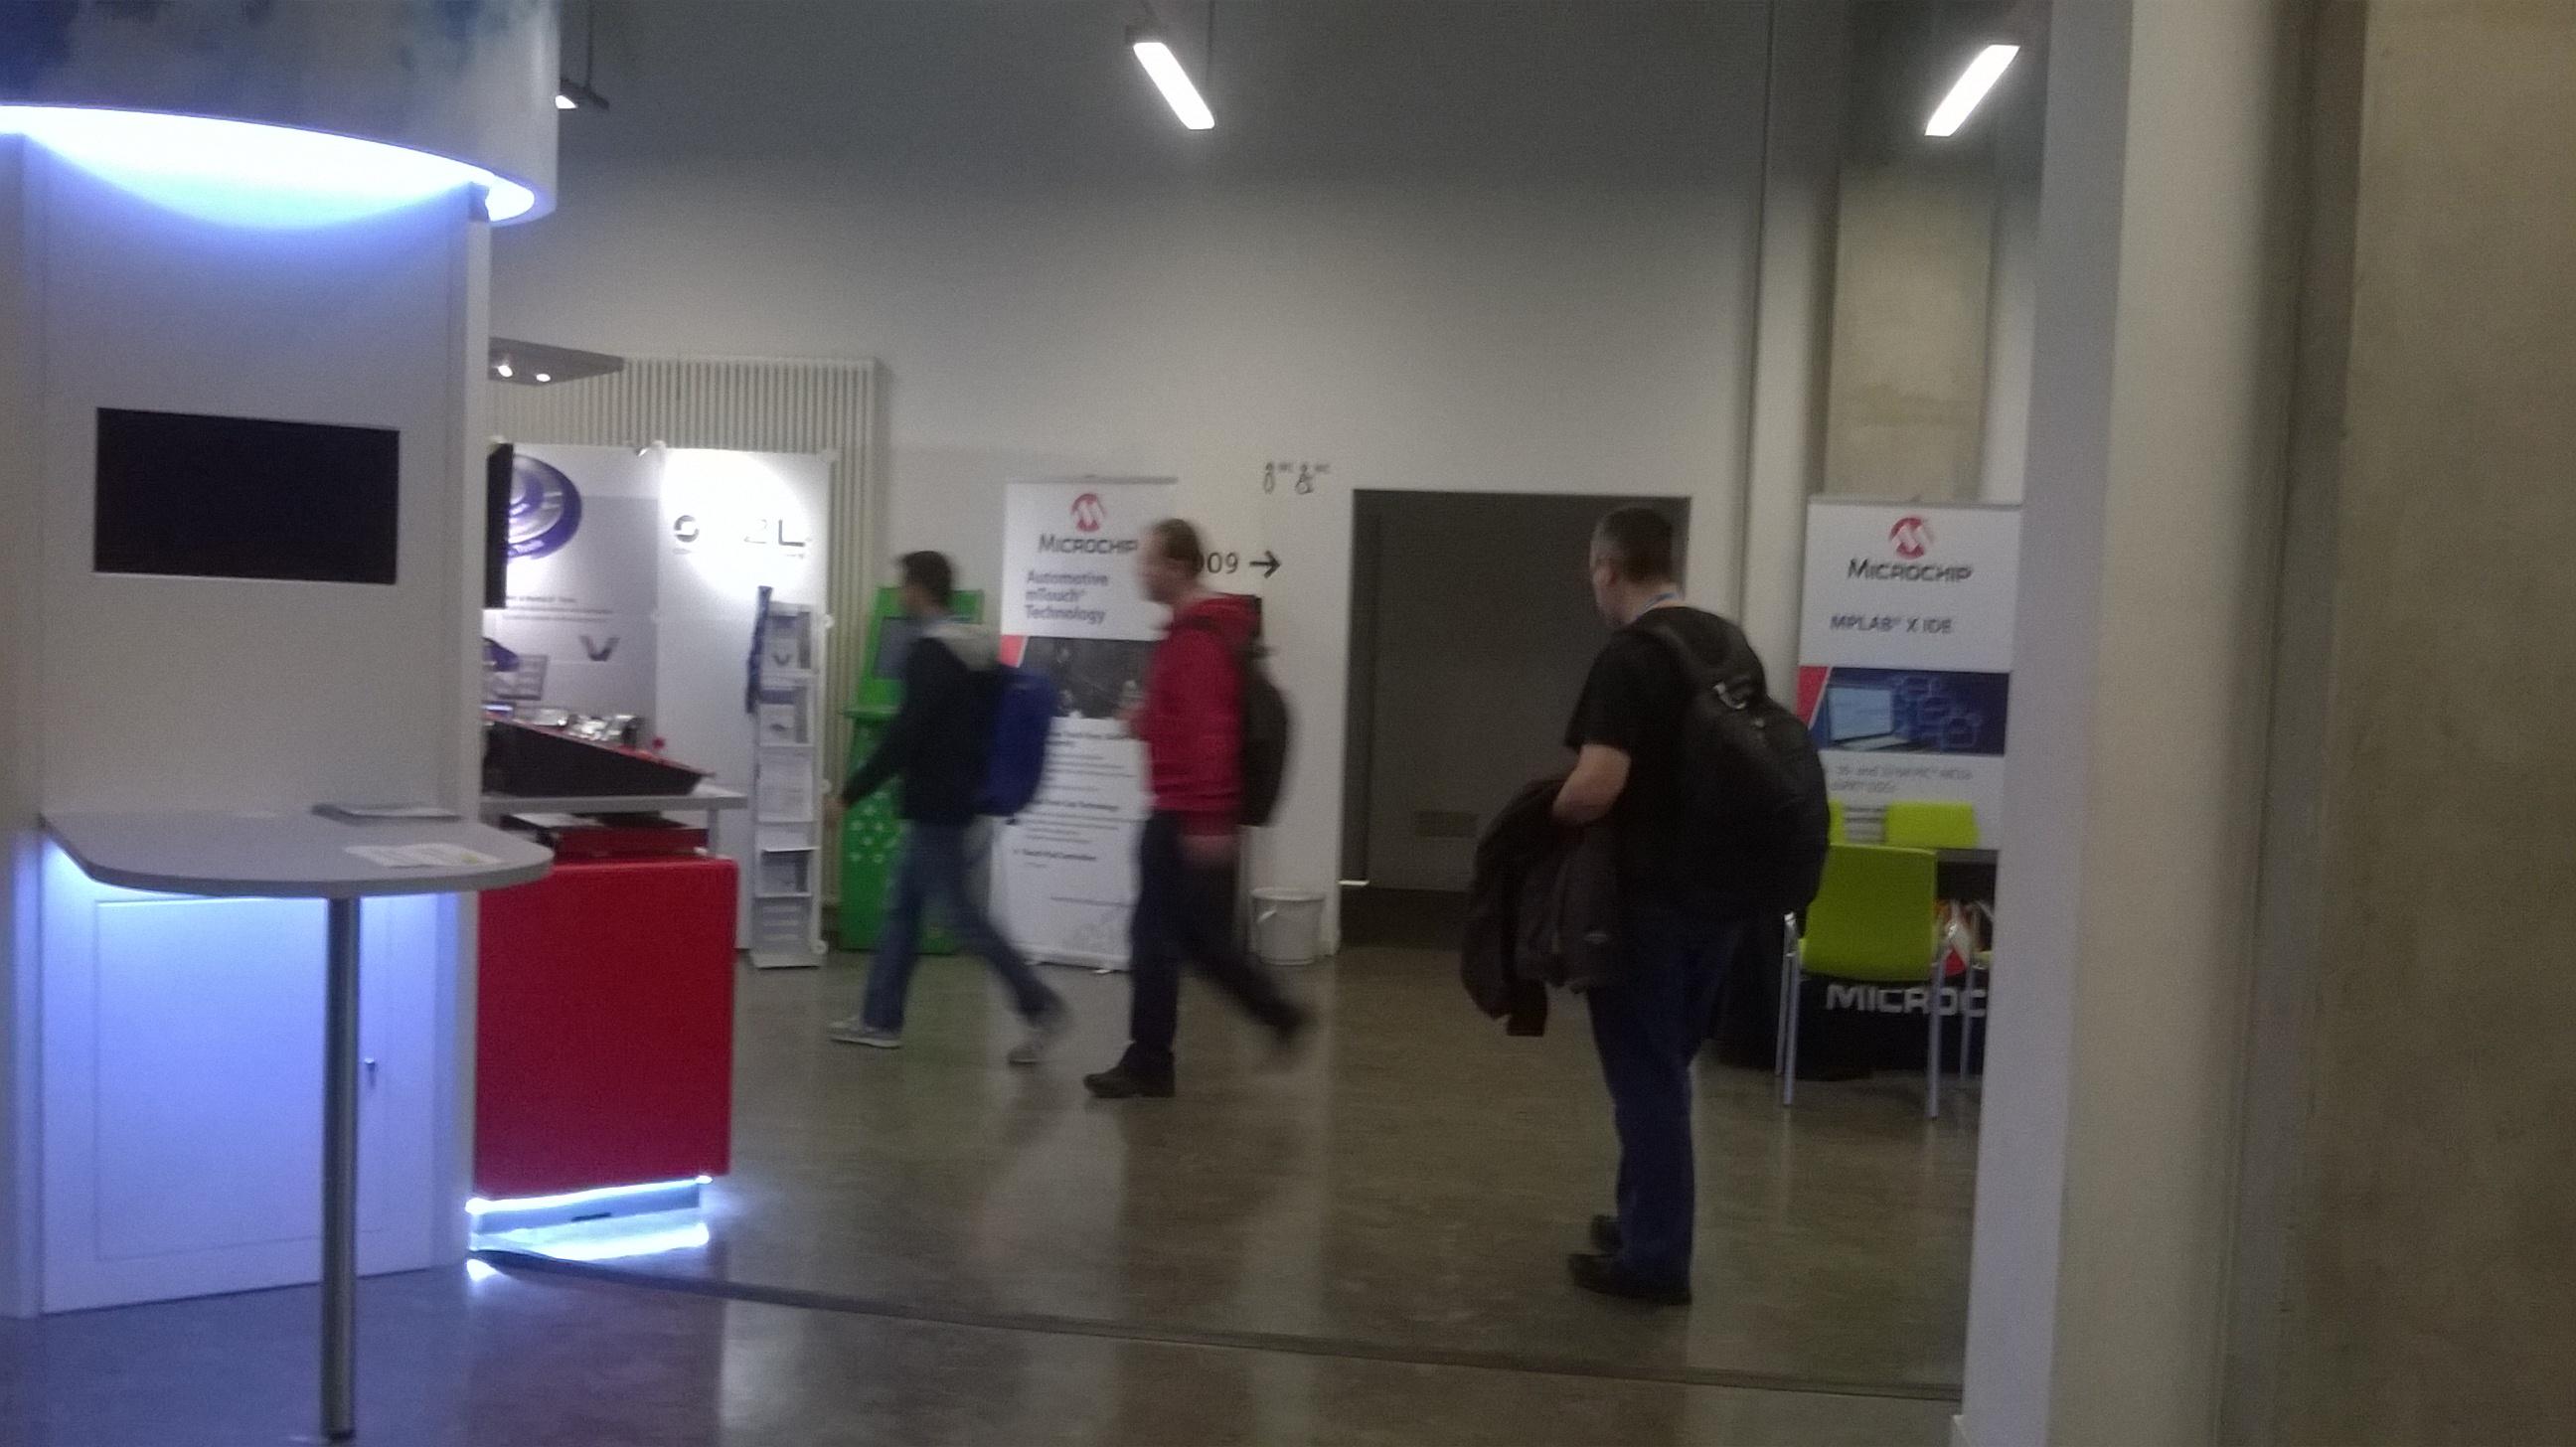 Microchip Masters 2015 à Berlin - Espace Expo